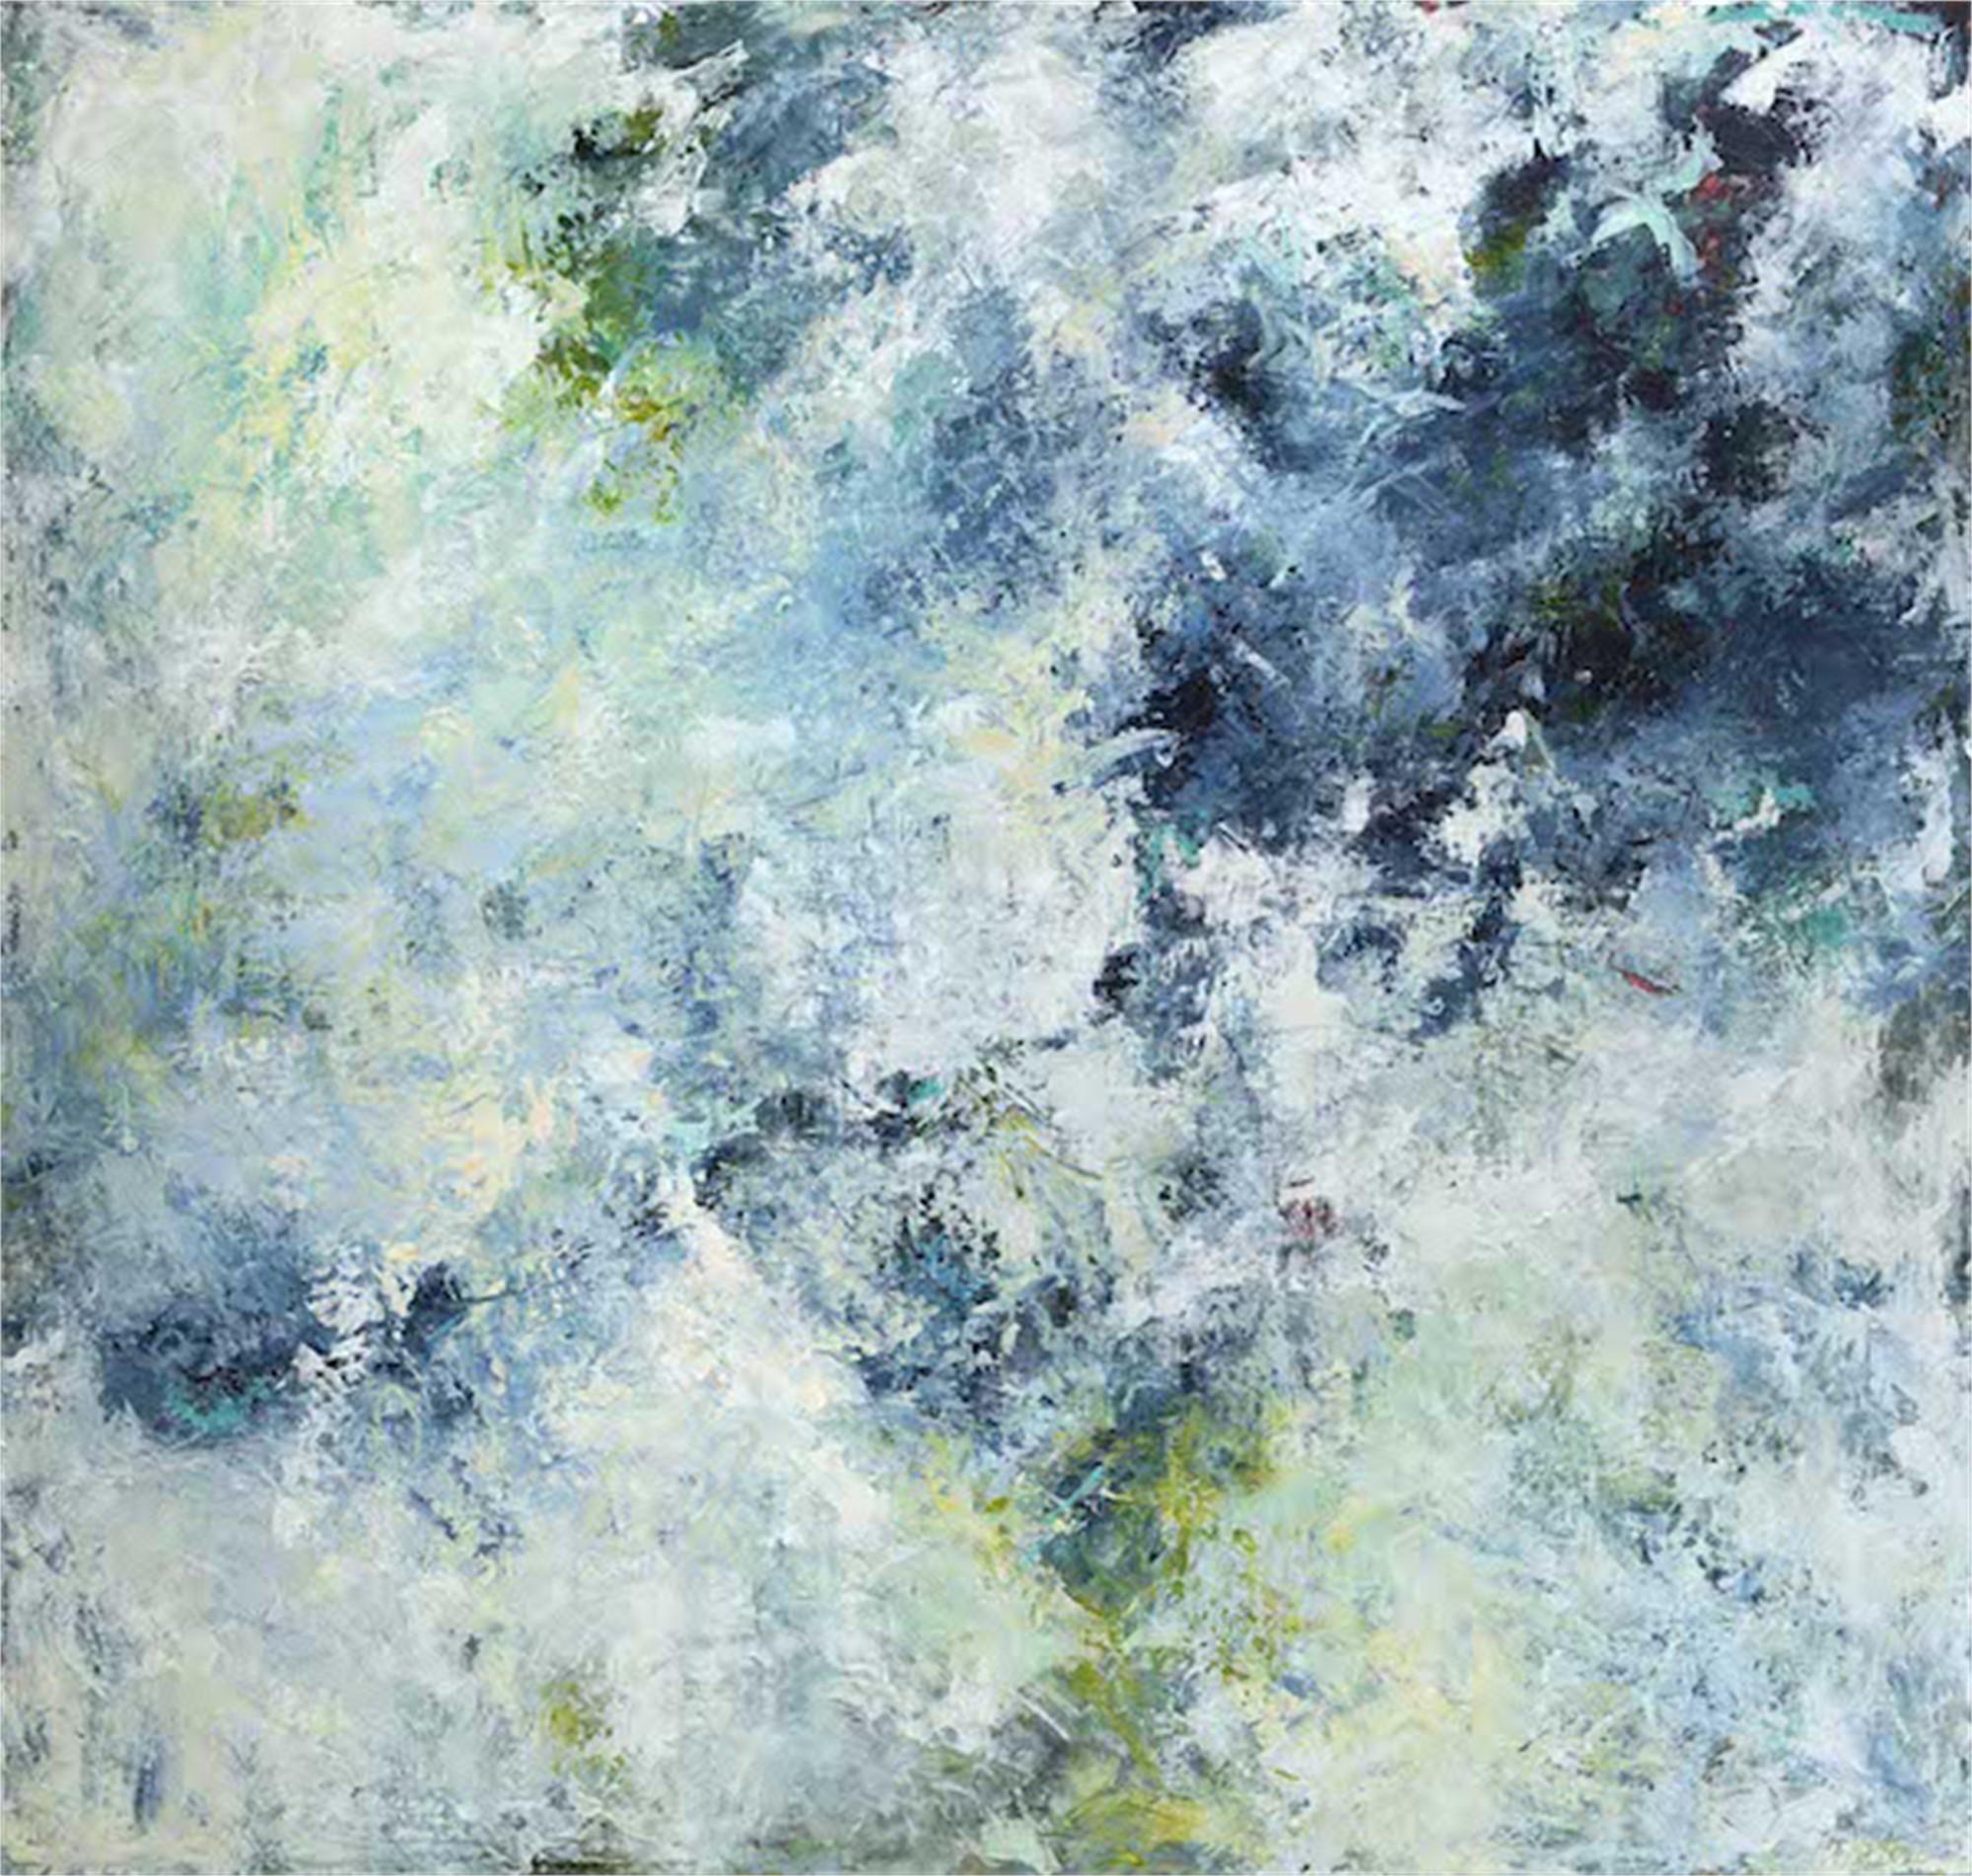 Drifting 4 by Cindy Walton